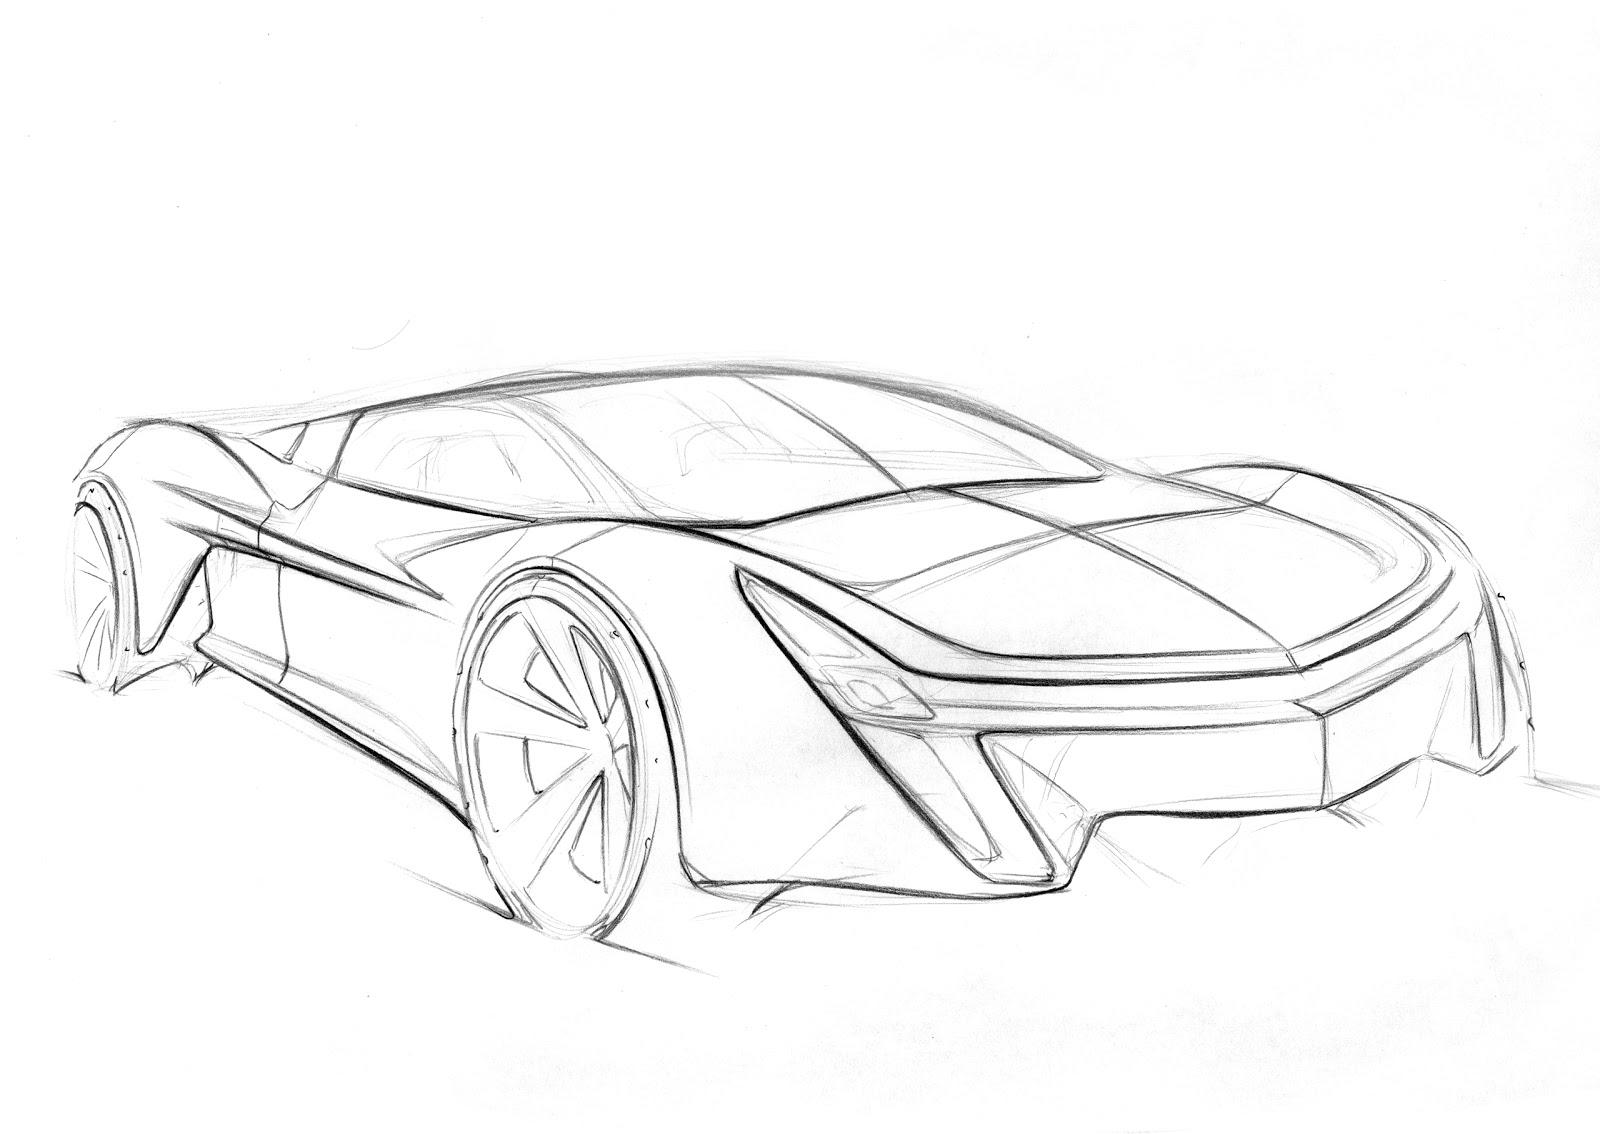 Paul Mutter Design Corvette Line Drawings